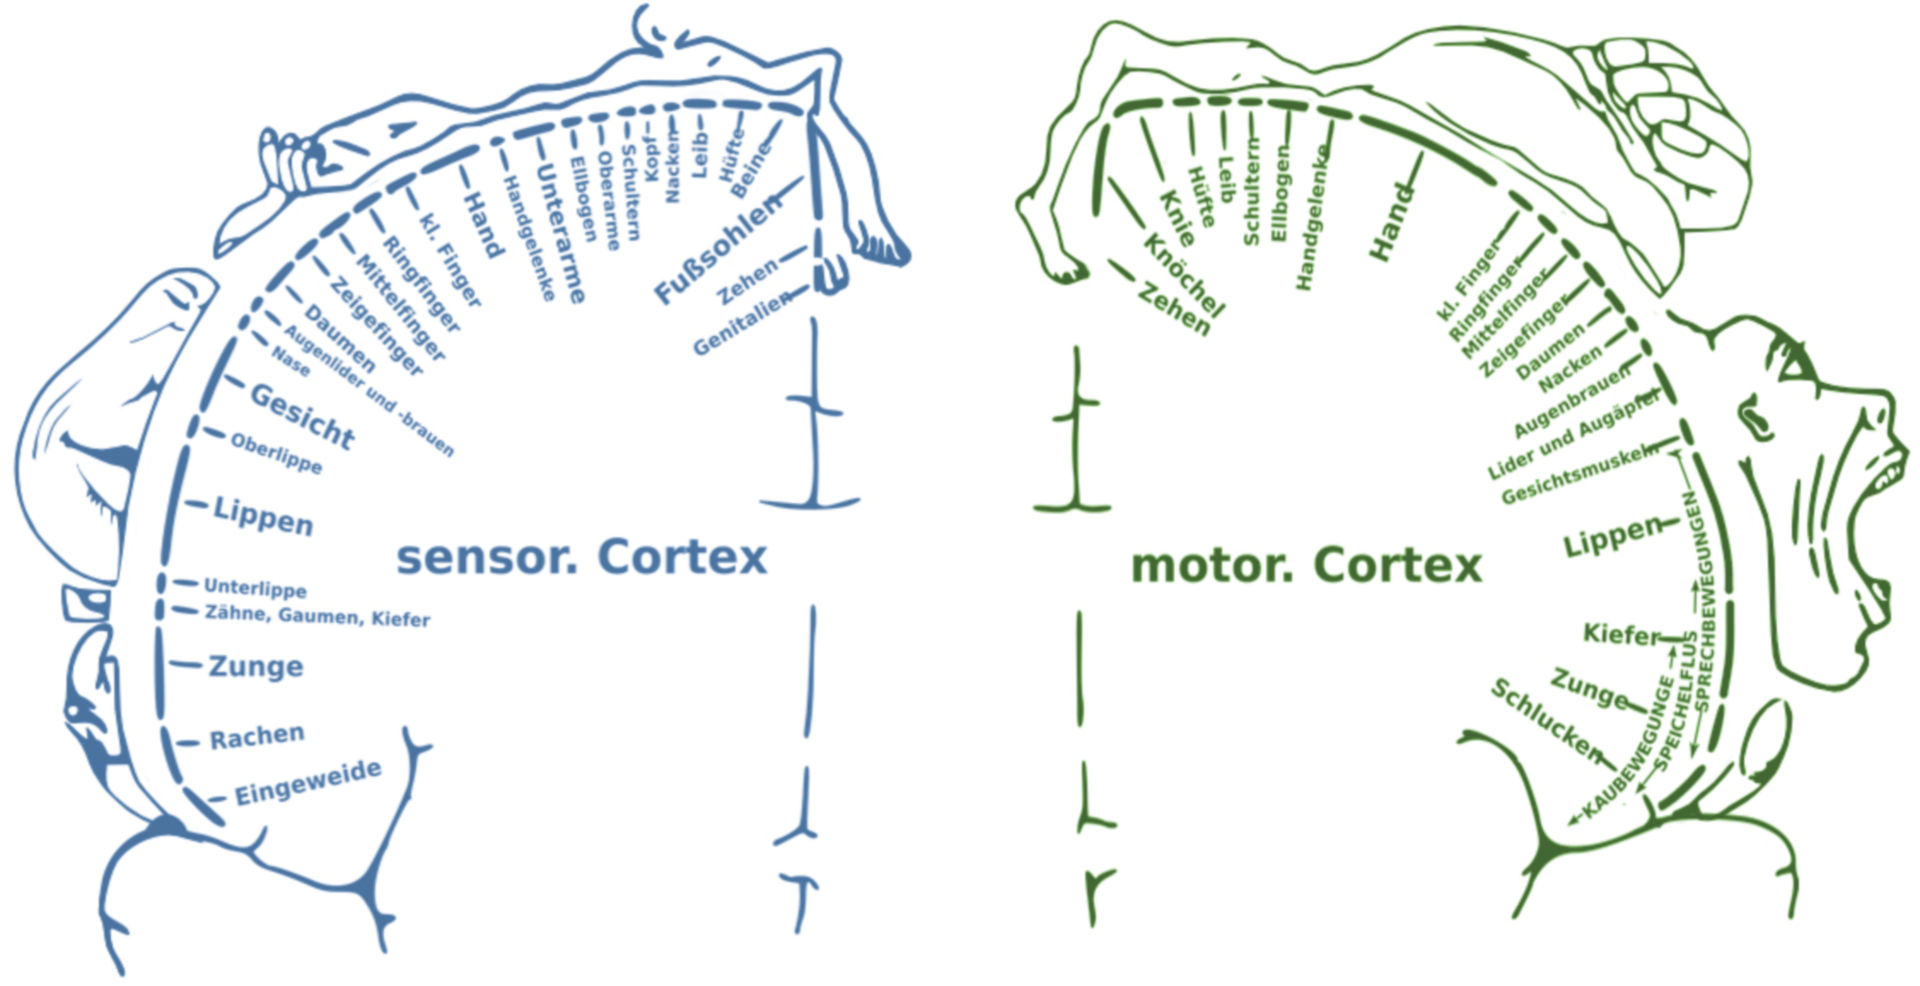 Homúnculo: Sensor y Motor (Esquema)